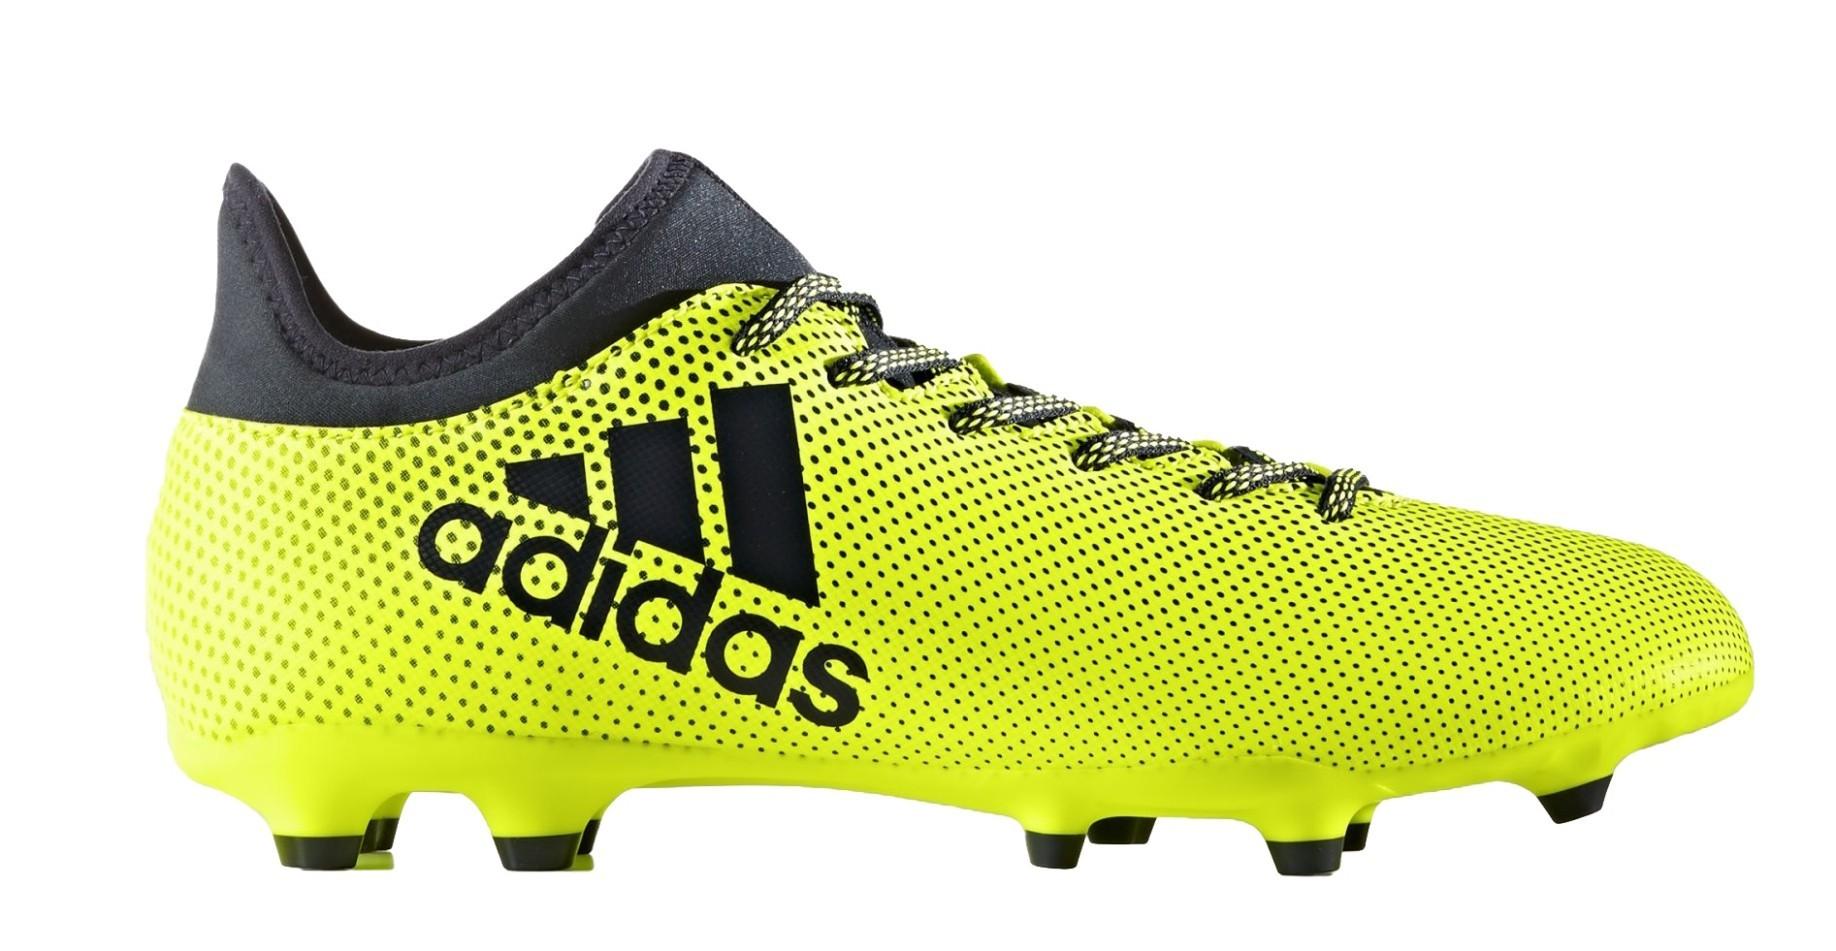 Fußball schuhe Adidas X 17.3 FG Ocean Storm Pack colore gelb